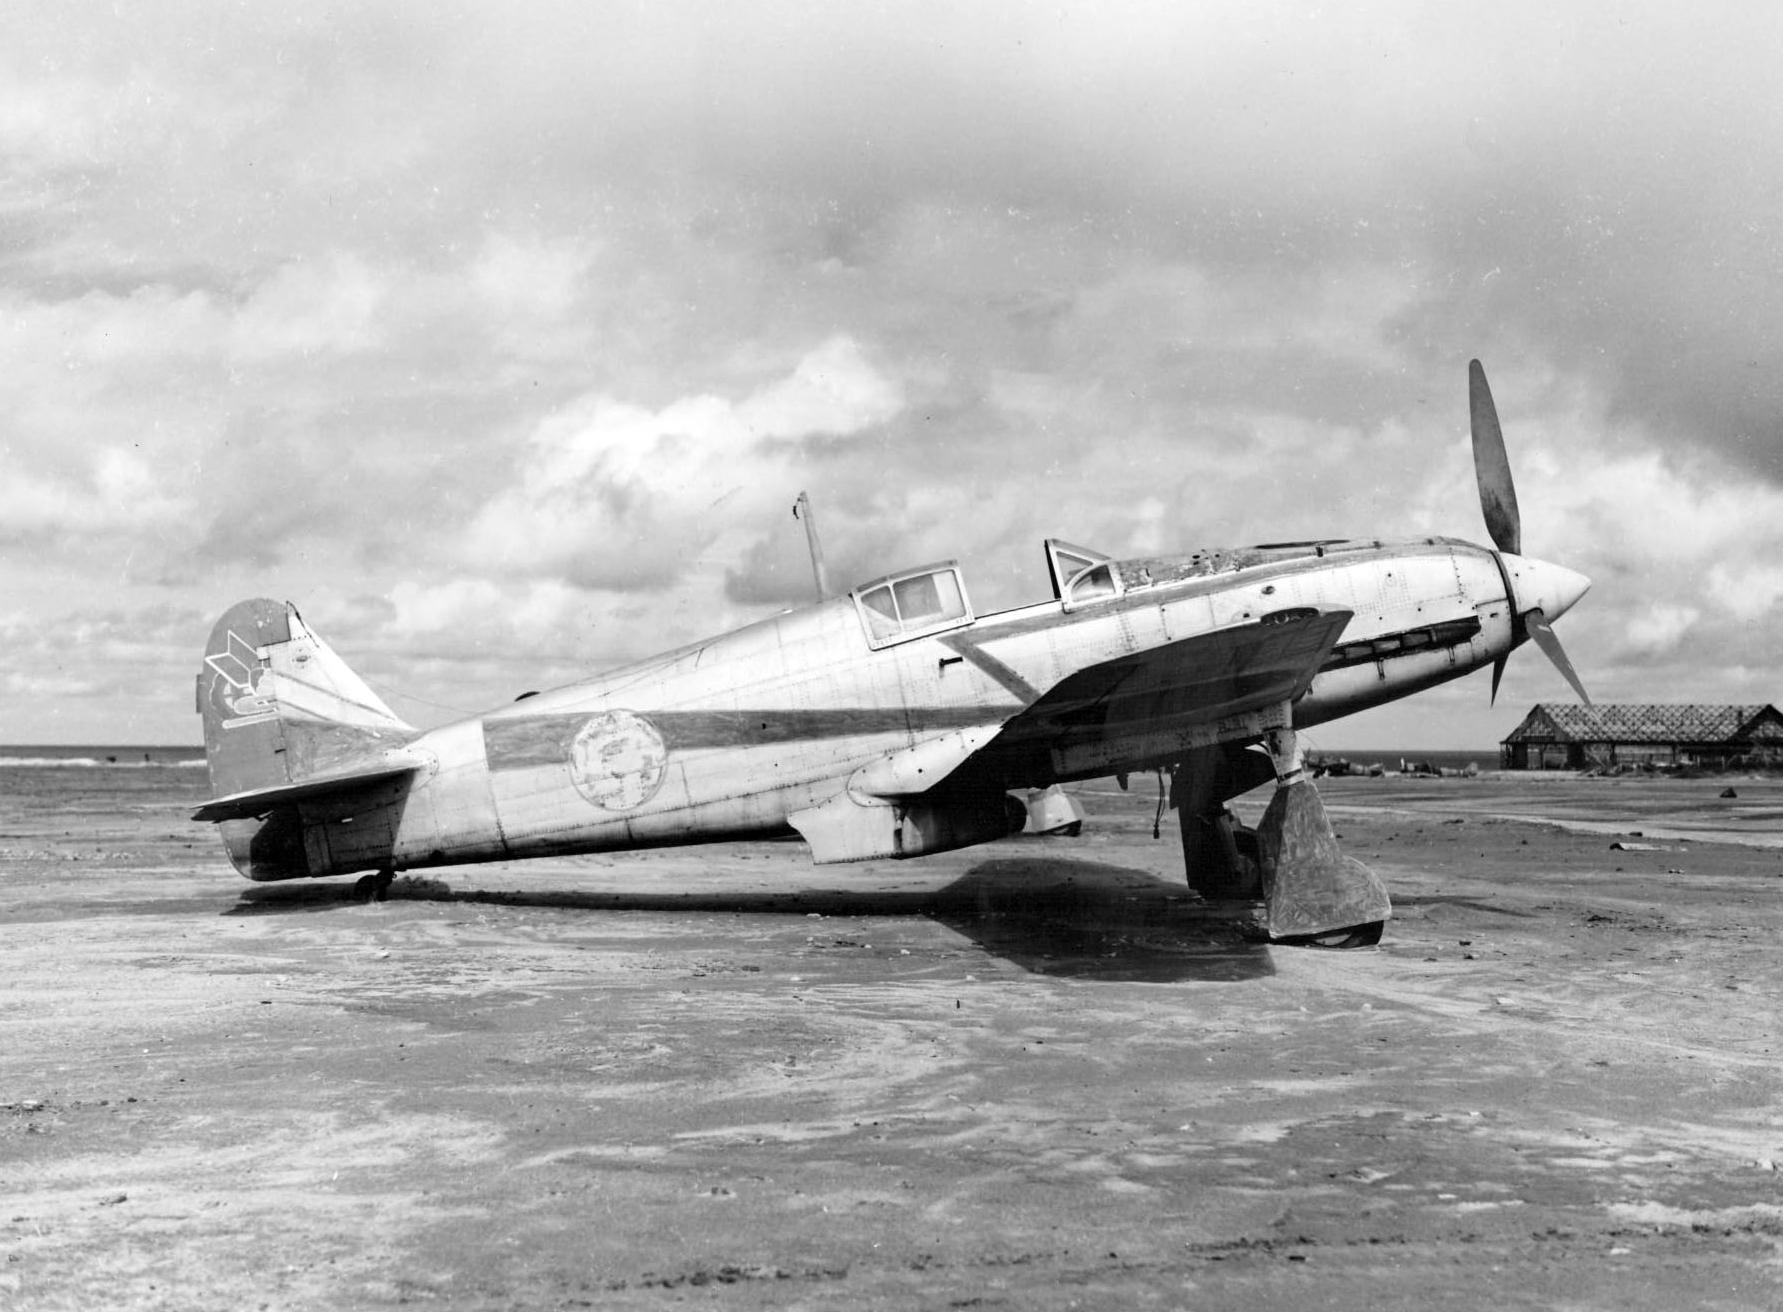 Ki-61_at_Fukuoka_in_1945.jpeg